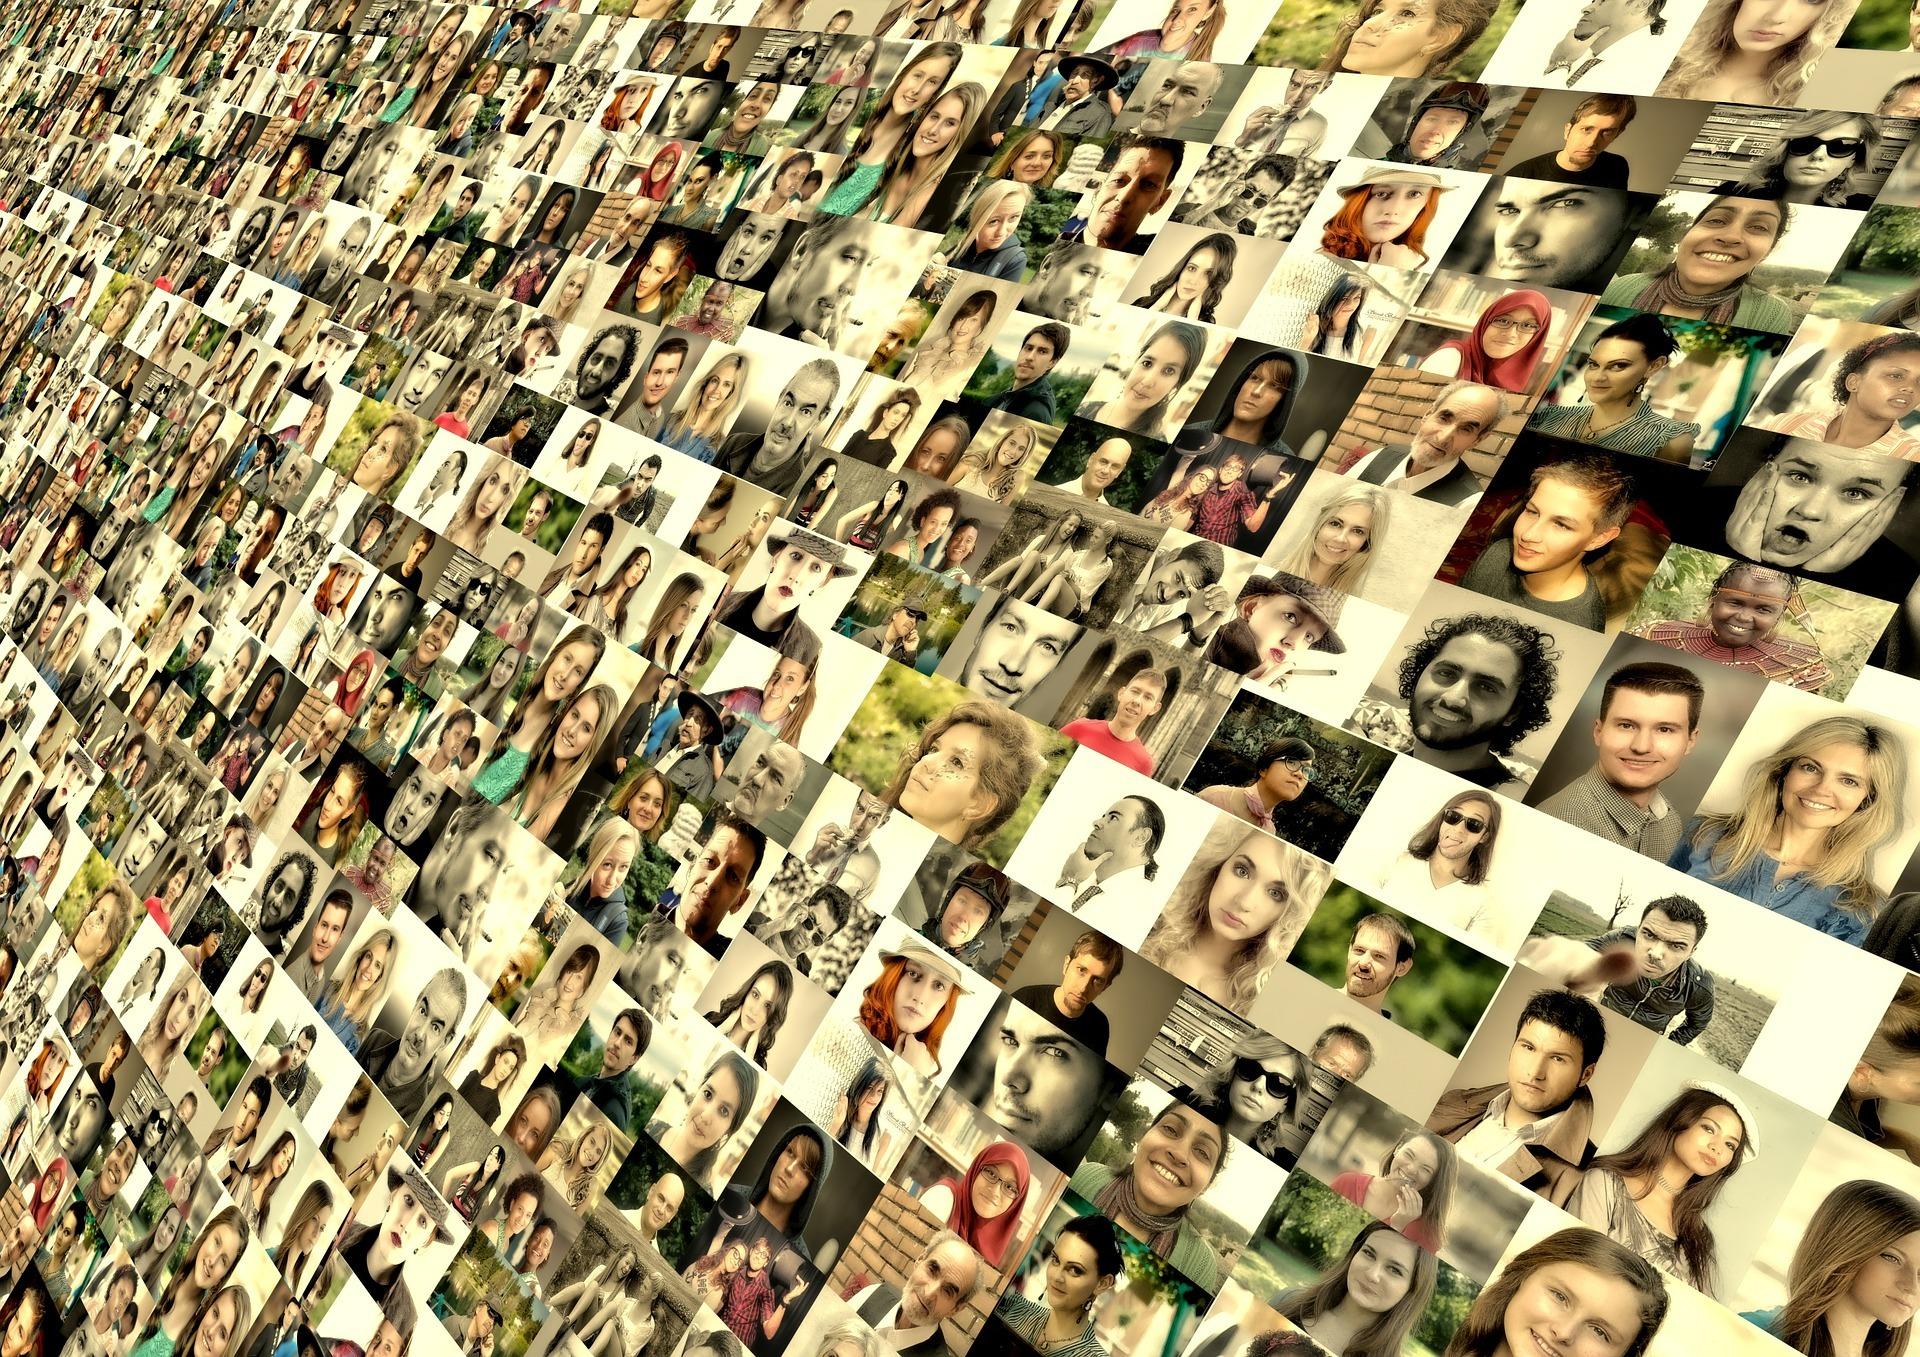 Digital strategy social media photo montage